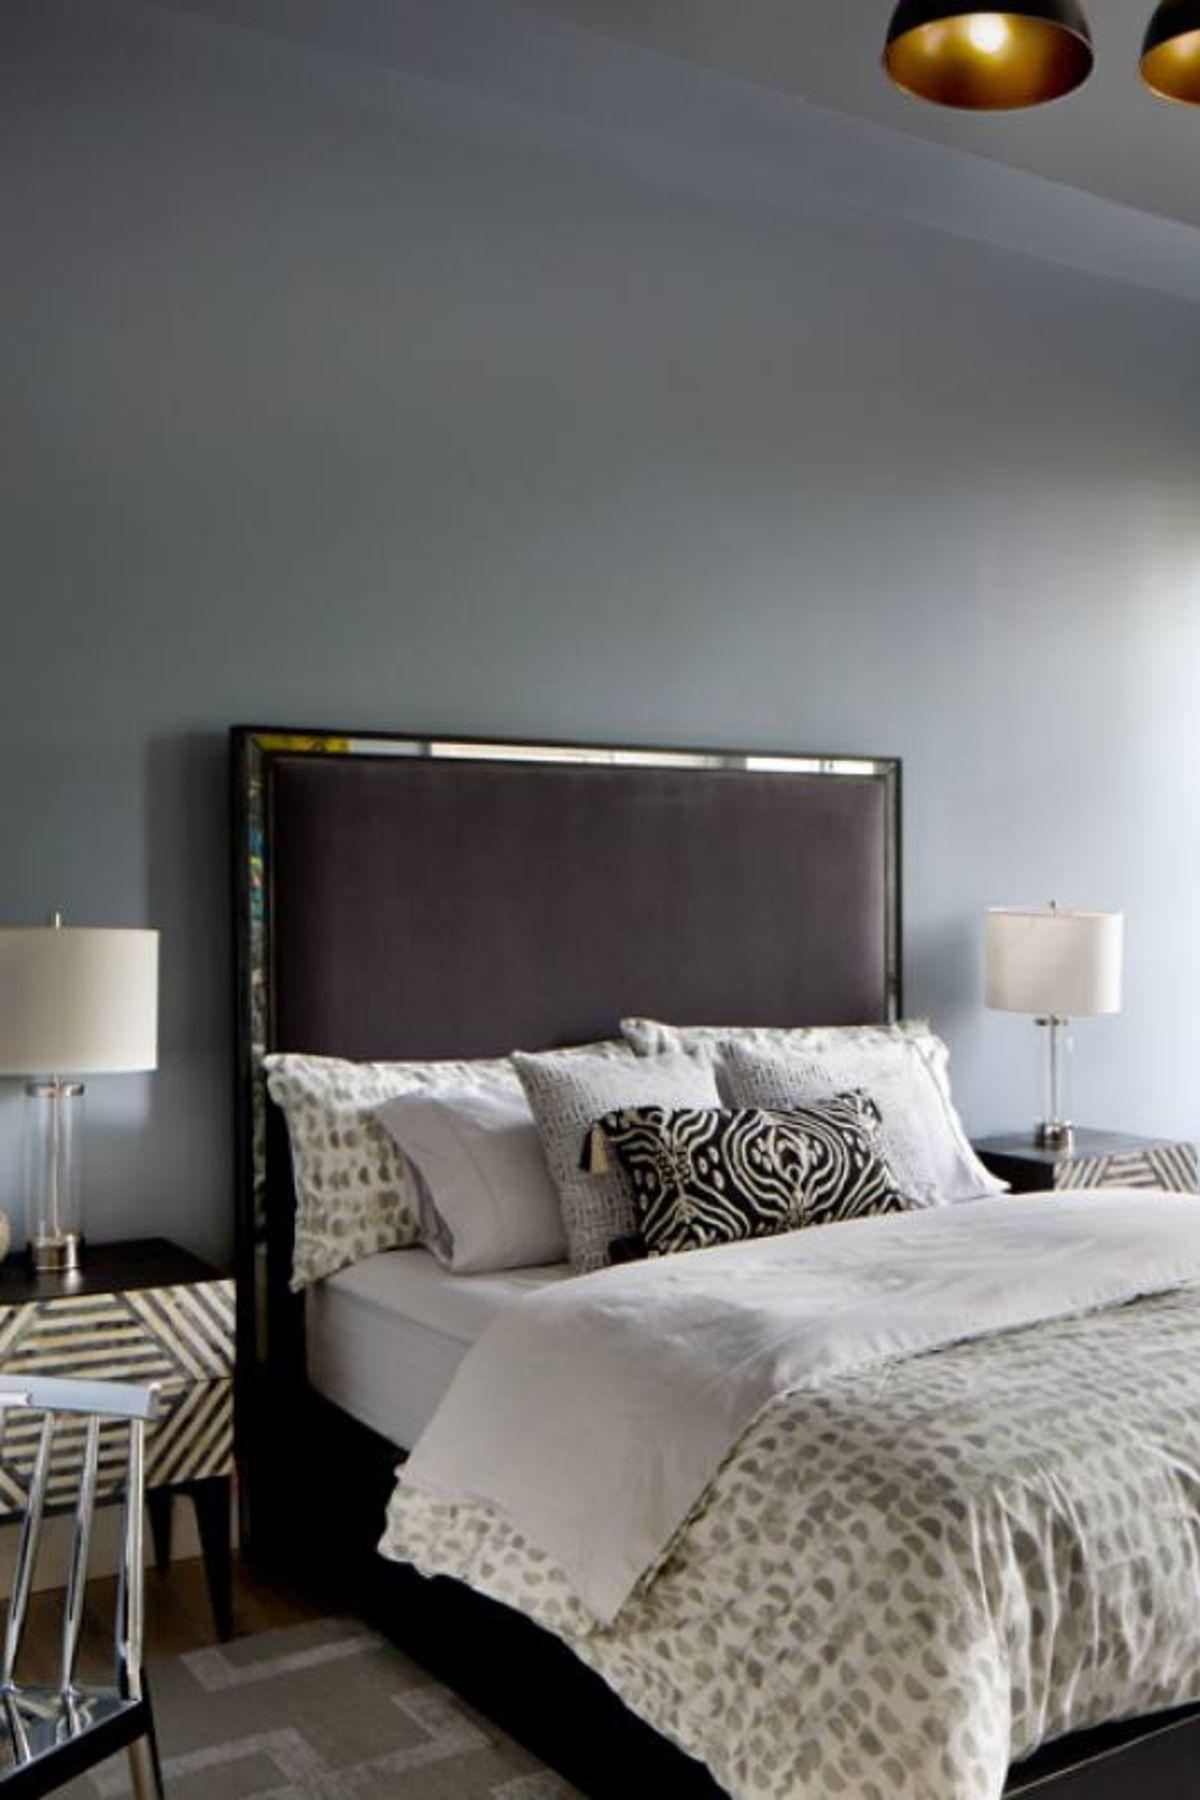 51 Gray Bedroom Decor Ideas Bedroom Decor On A Budget Grey Bedroom Decor Simple Bedroom